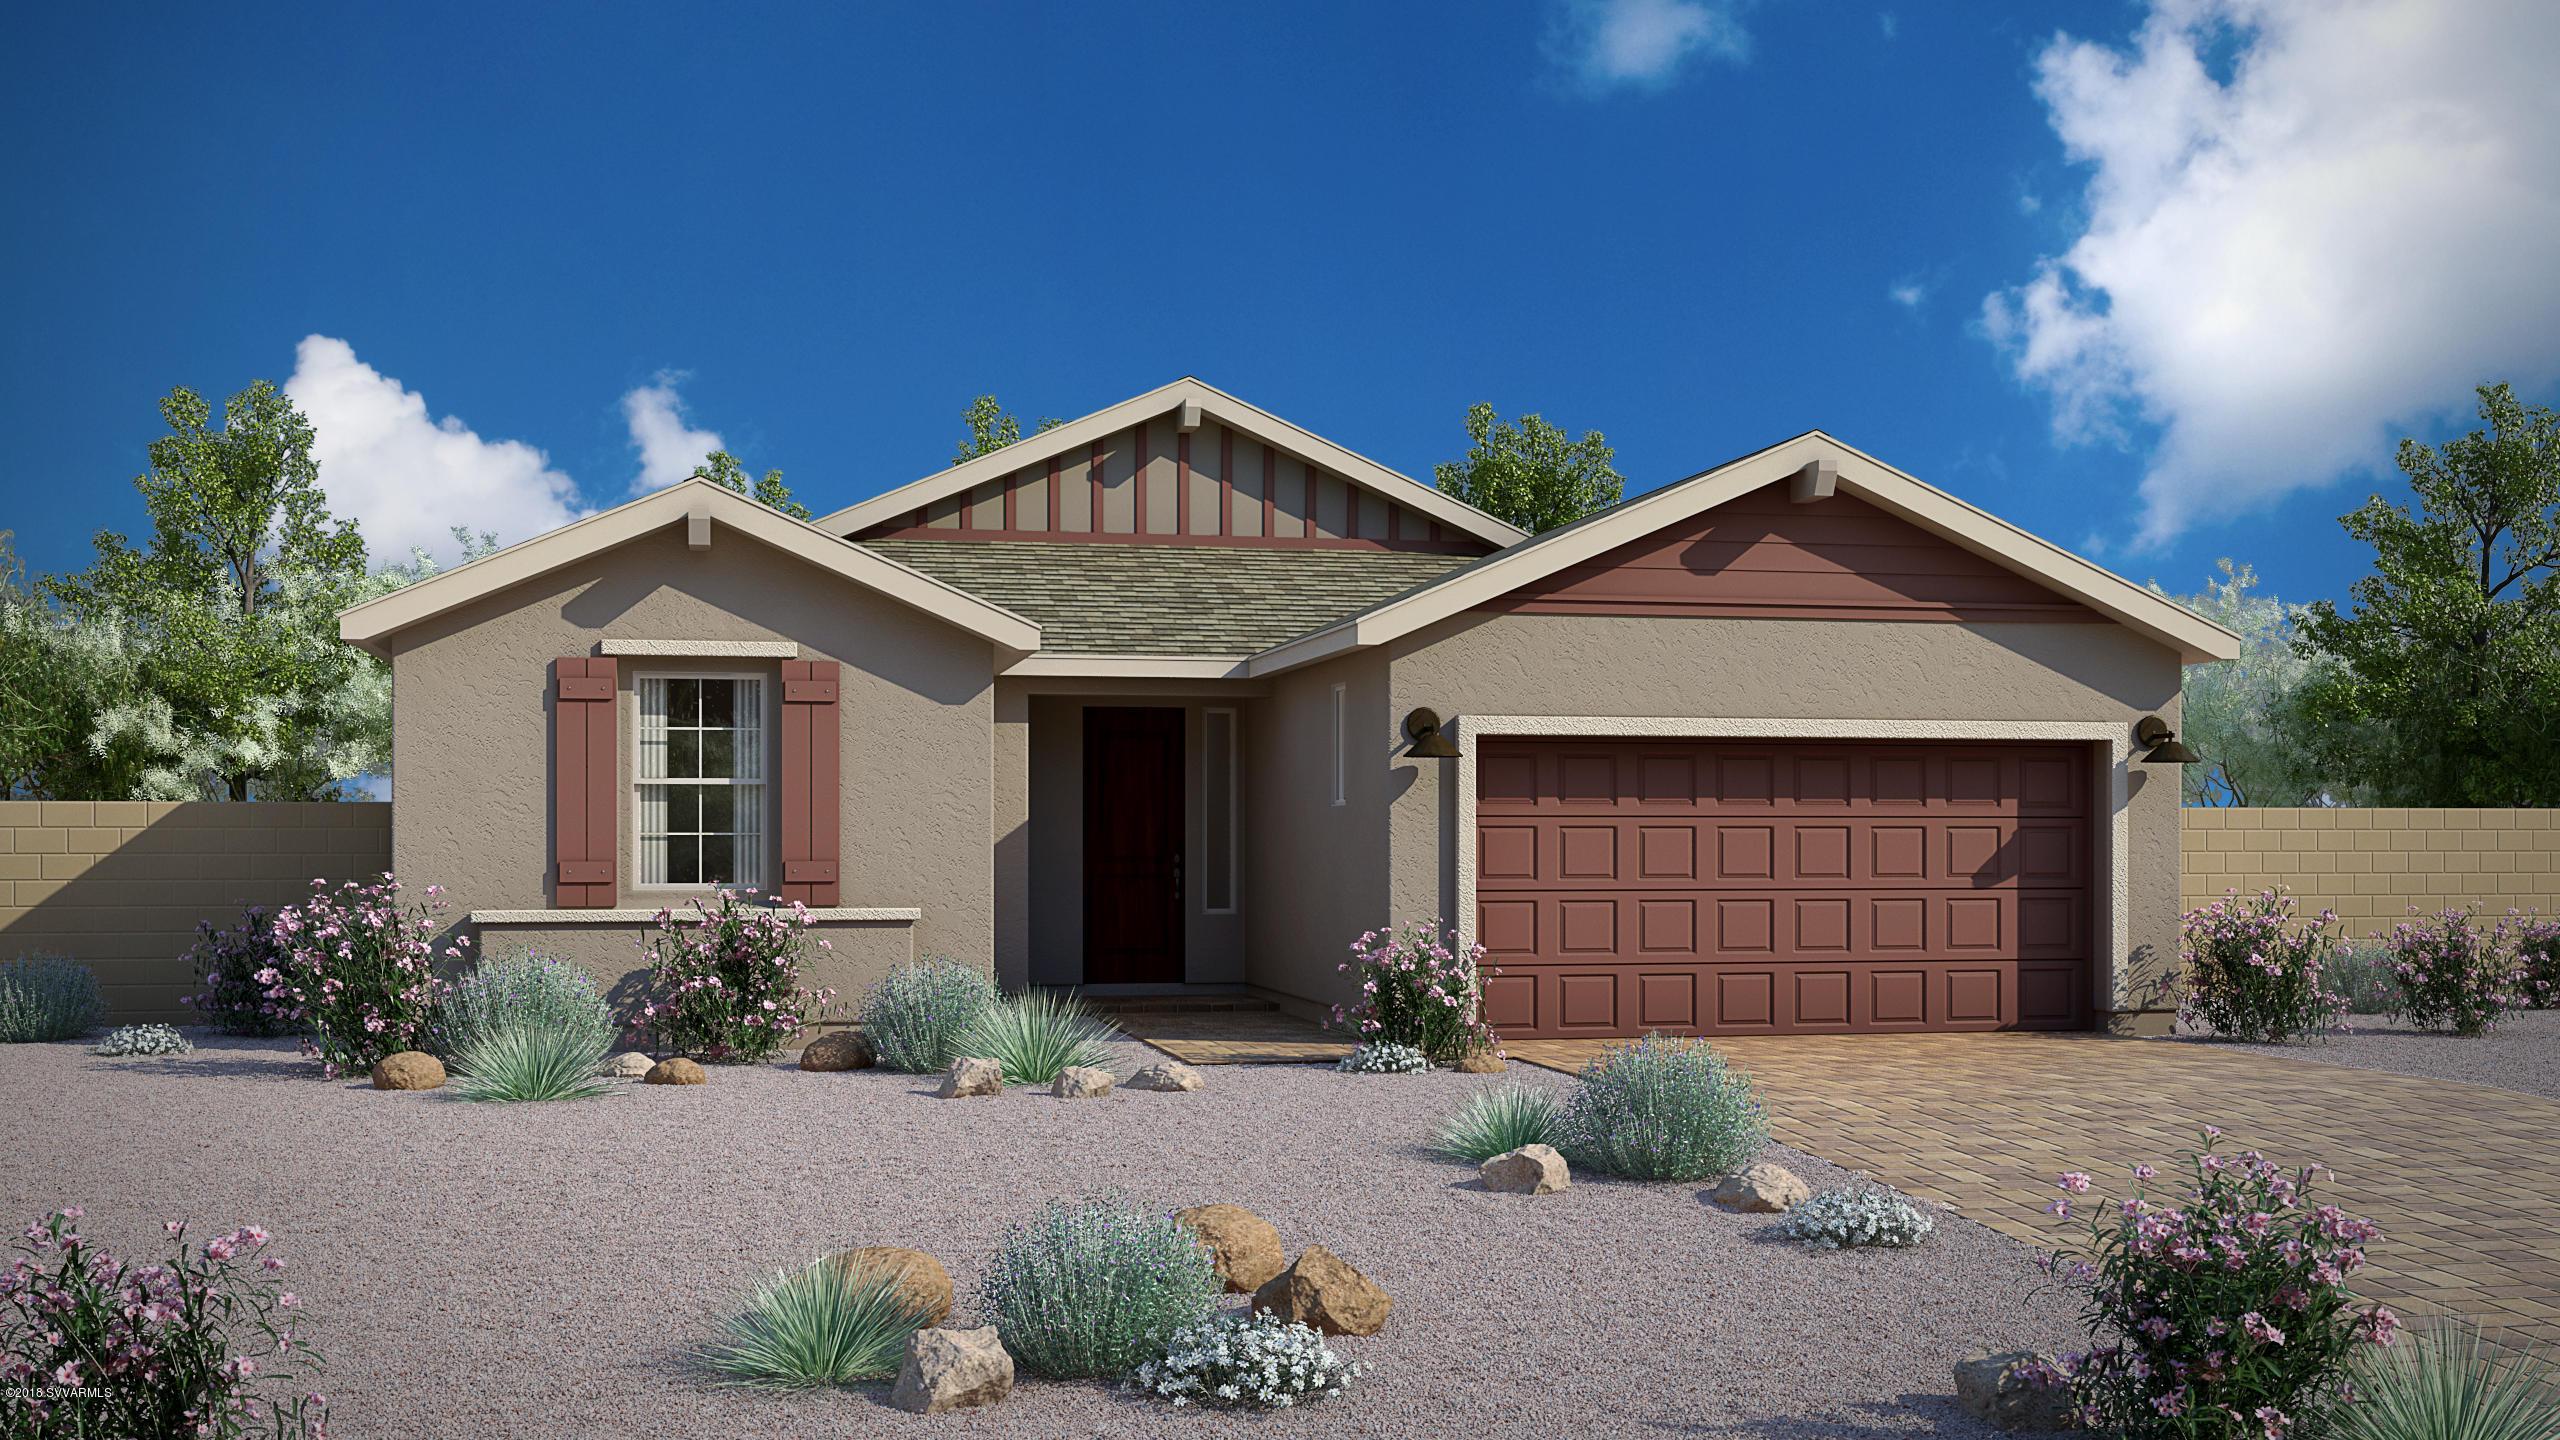 260 Whistle Stop Rd Clarkdale, AZ 86324